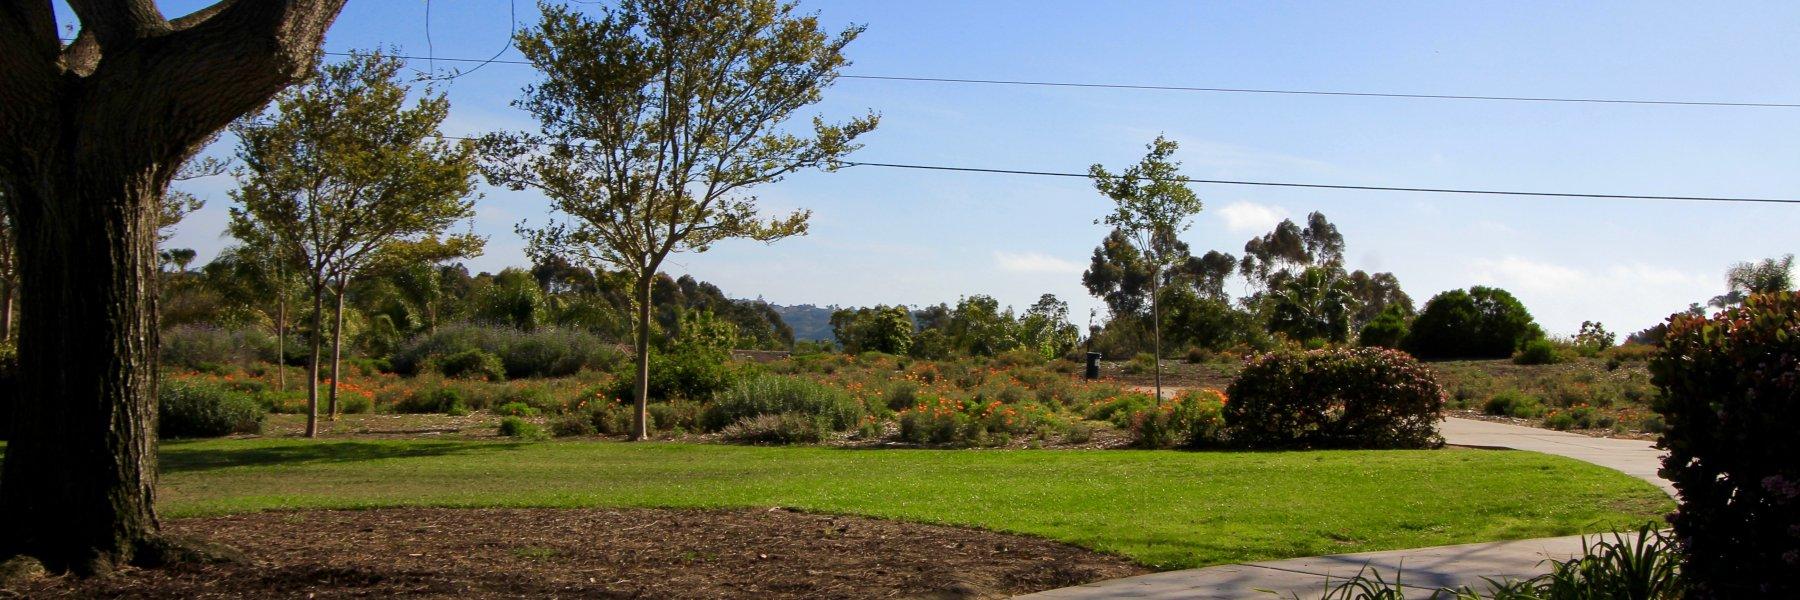 Sanderling is a community of homes in Carlsbad California